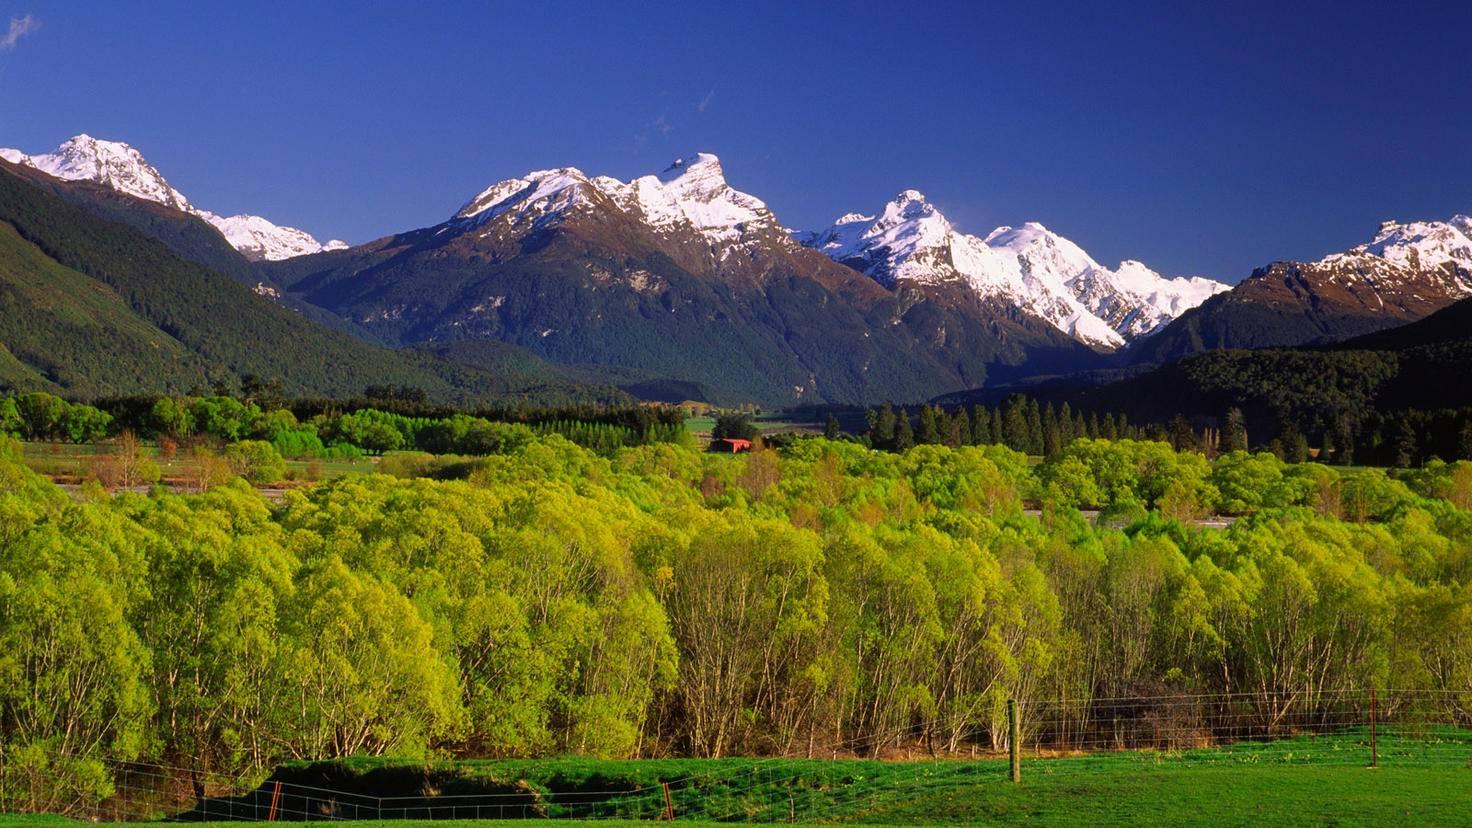 Lothlorien-Herr der Ringe Drehorte-Neuseeland-Radius Images-GettyImages-77027060